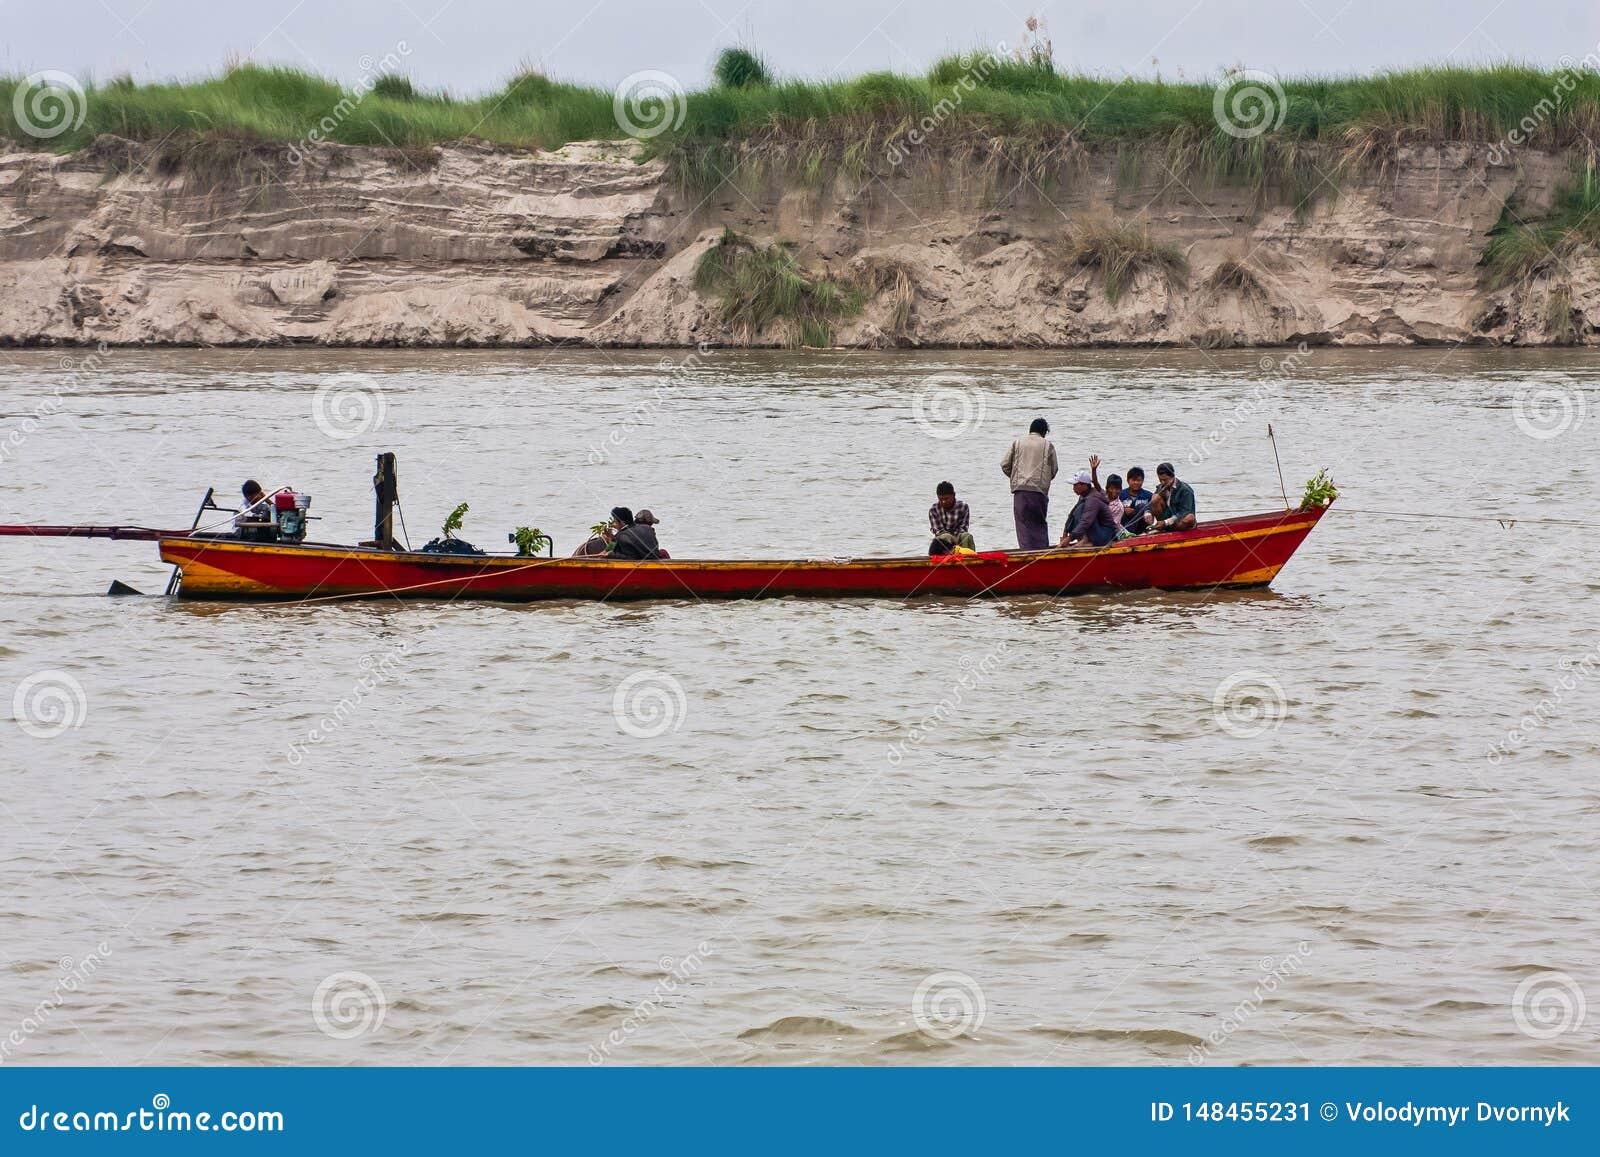 En flodtaxi på den Irrawaddy floden nära Mandalay, Myanmar